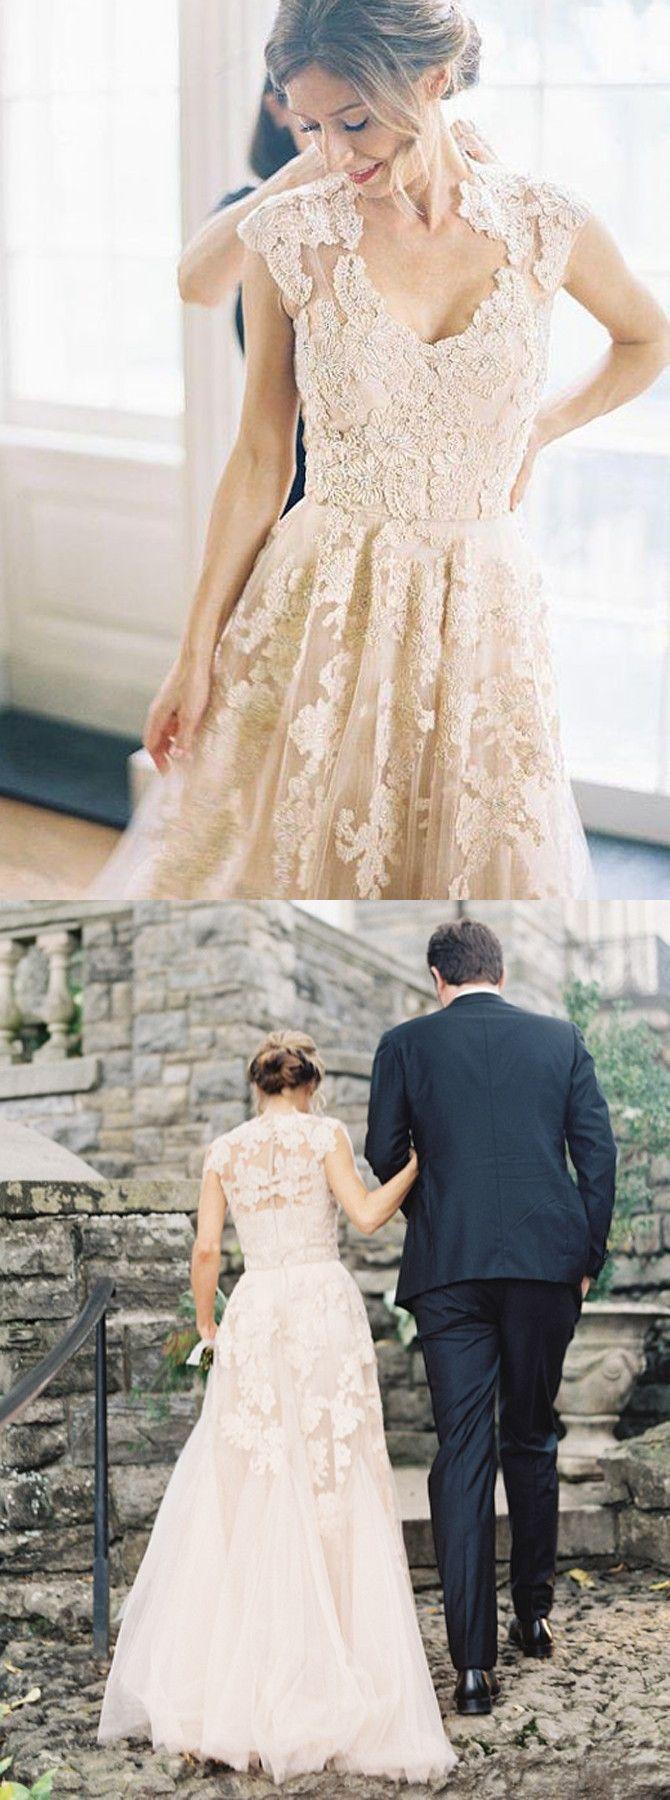 94 best Vintage Brautkleider images on Pinterest | Wedding ideas ...